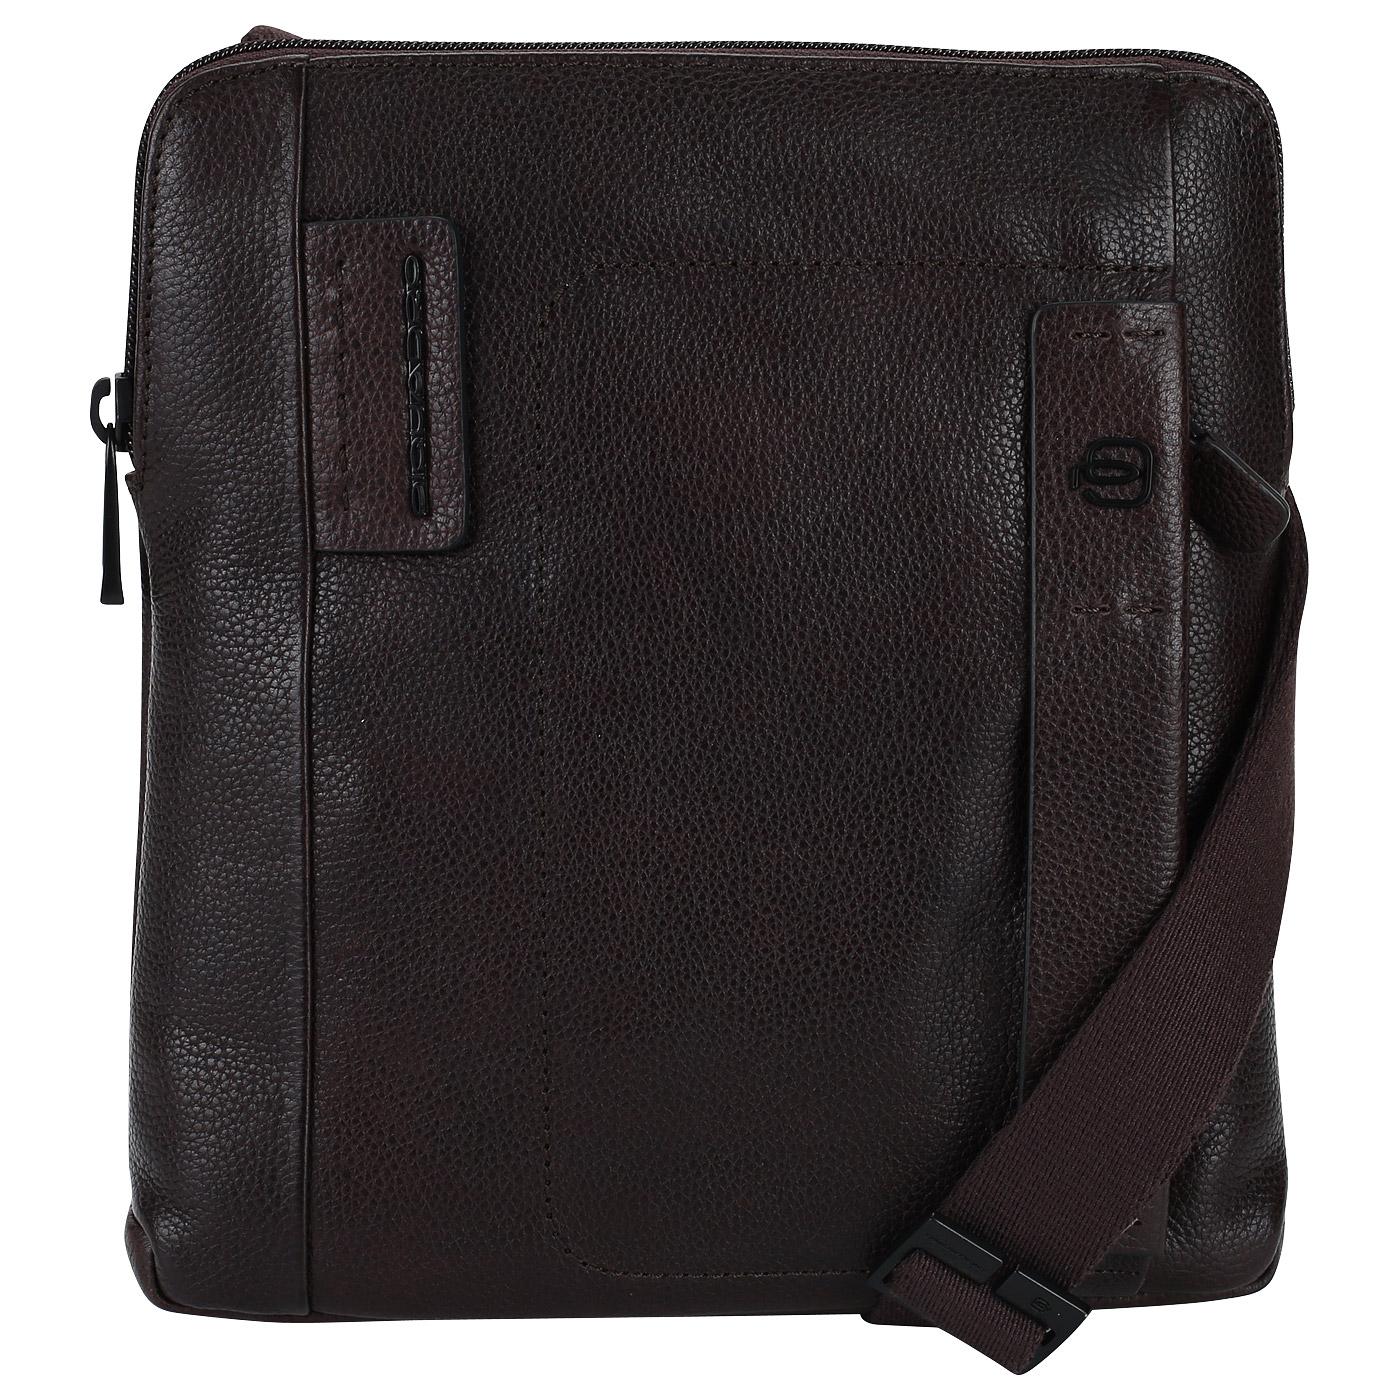 5080f9742bb1 Мужская сумка-планшет из коричневой кожи Piquadro Plus CA1358P15S/TM ...